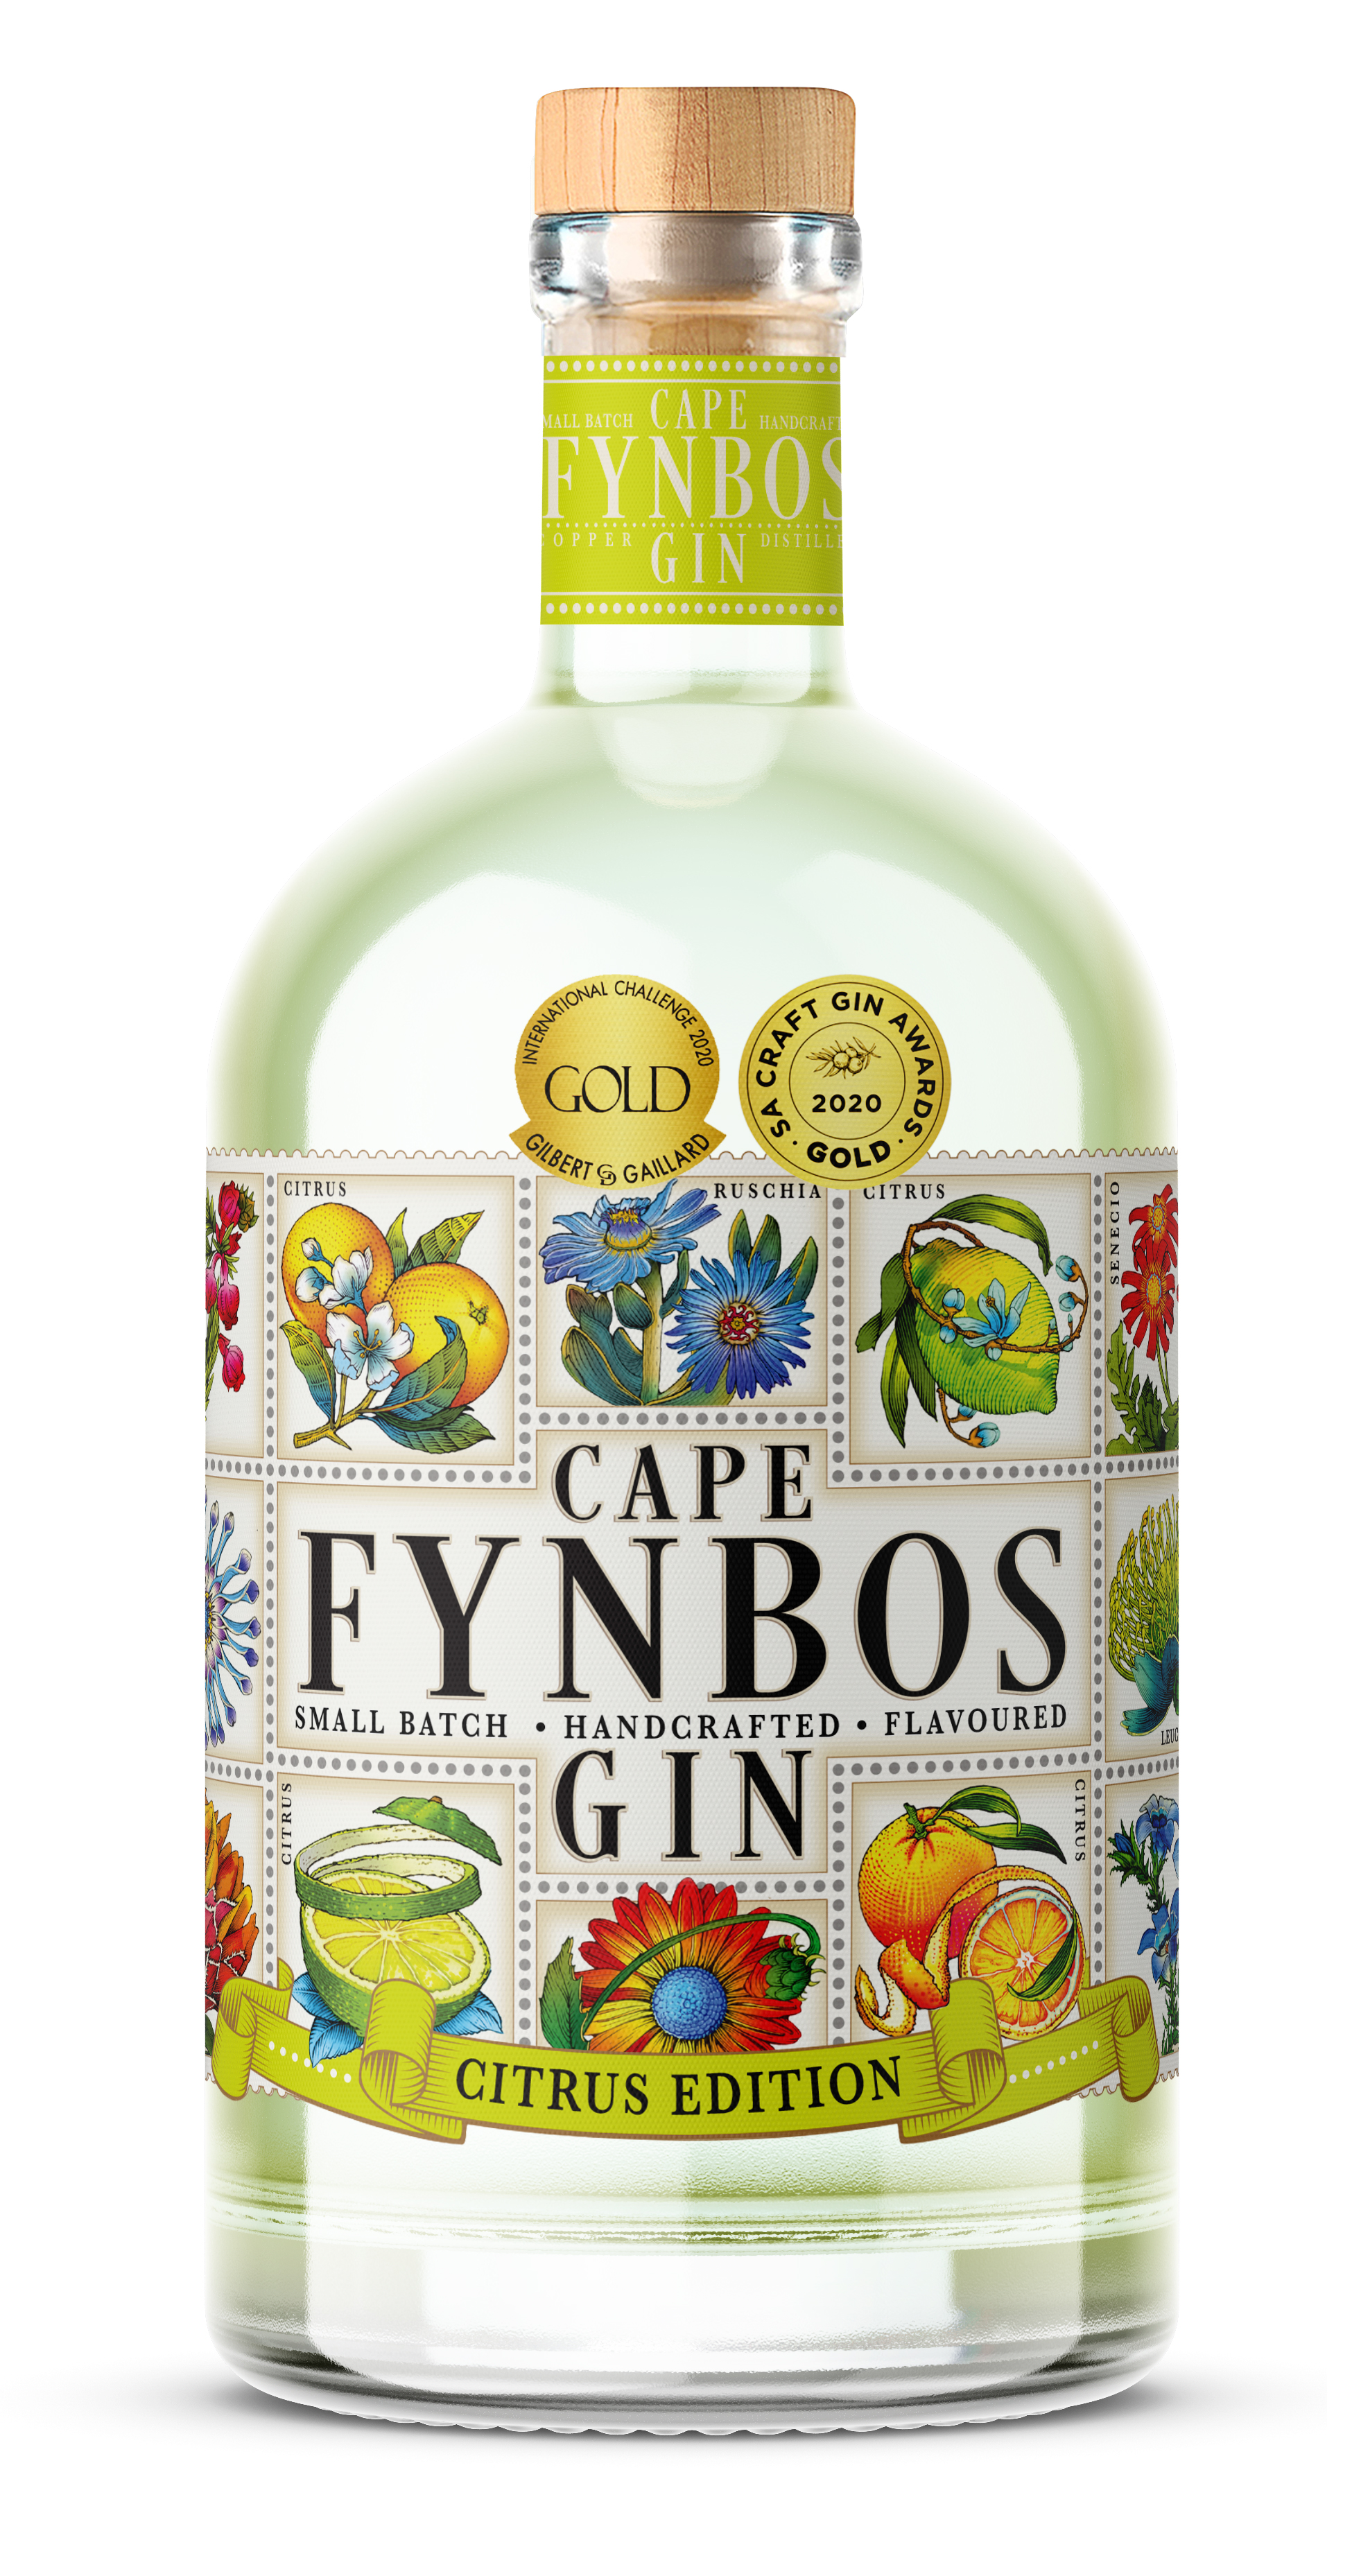 Cape Fynbos Citrus Edition Gin